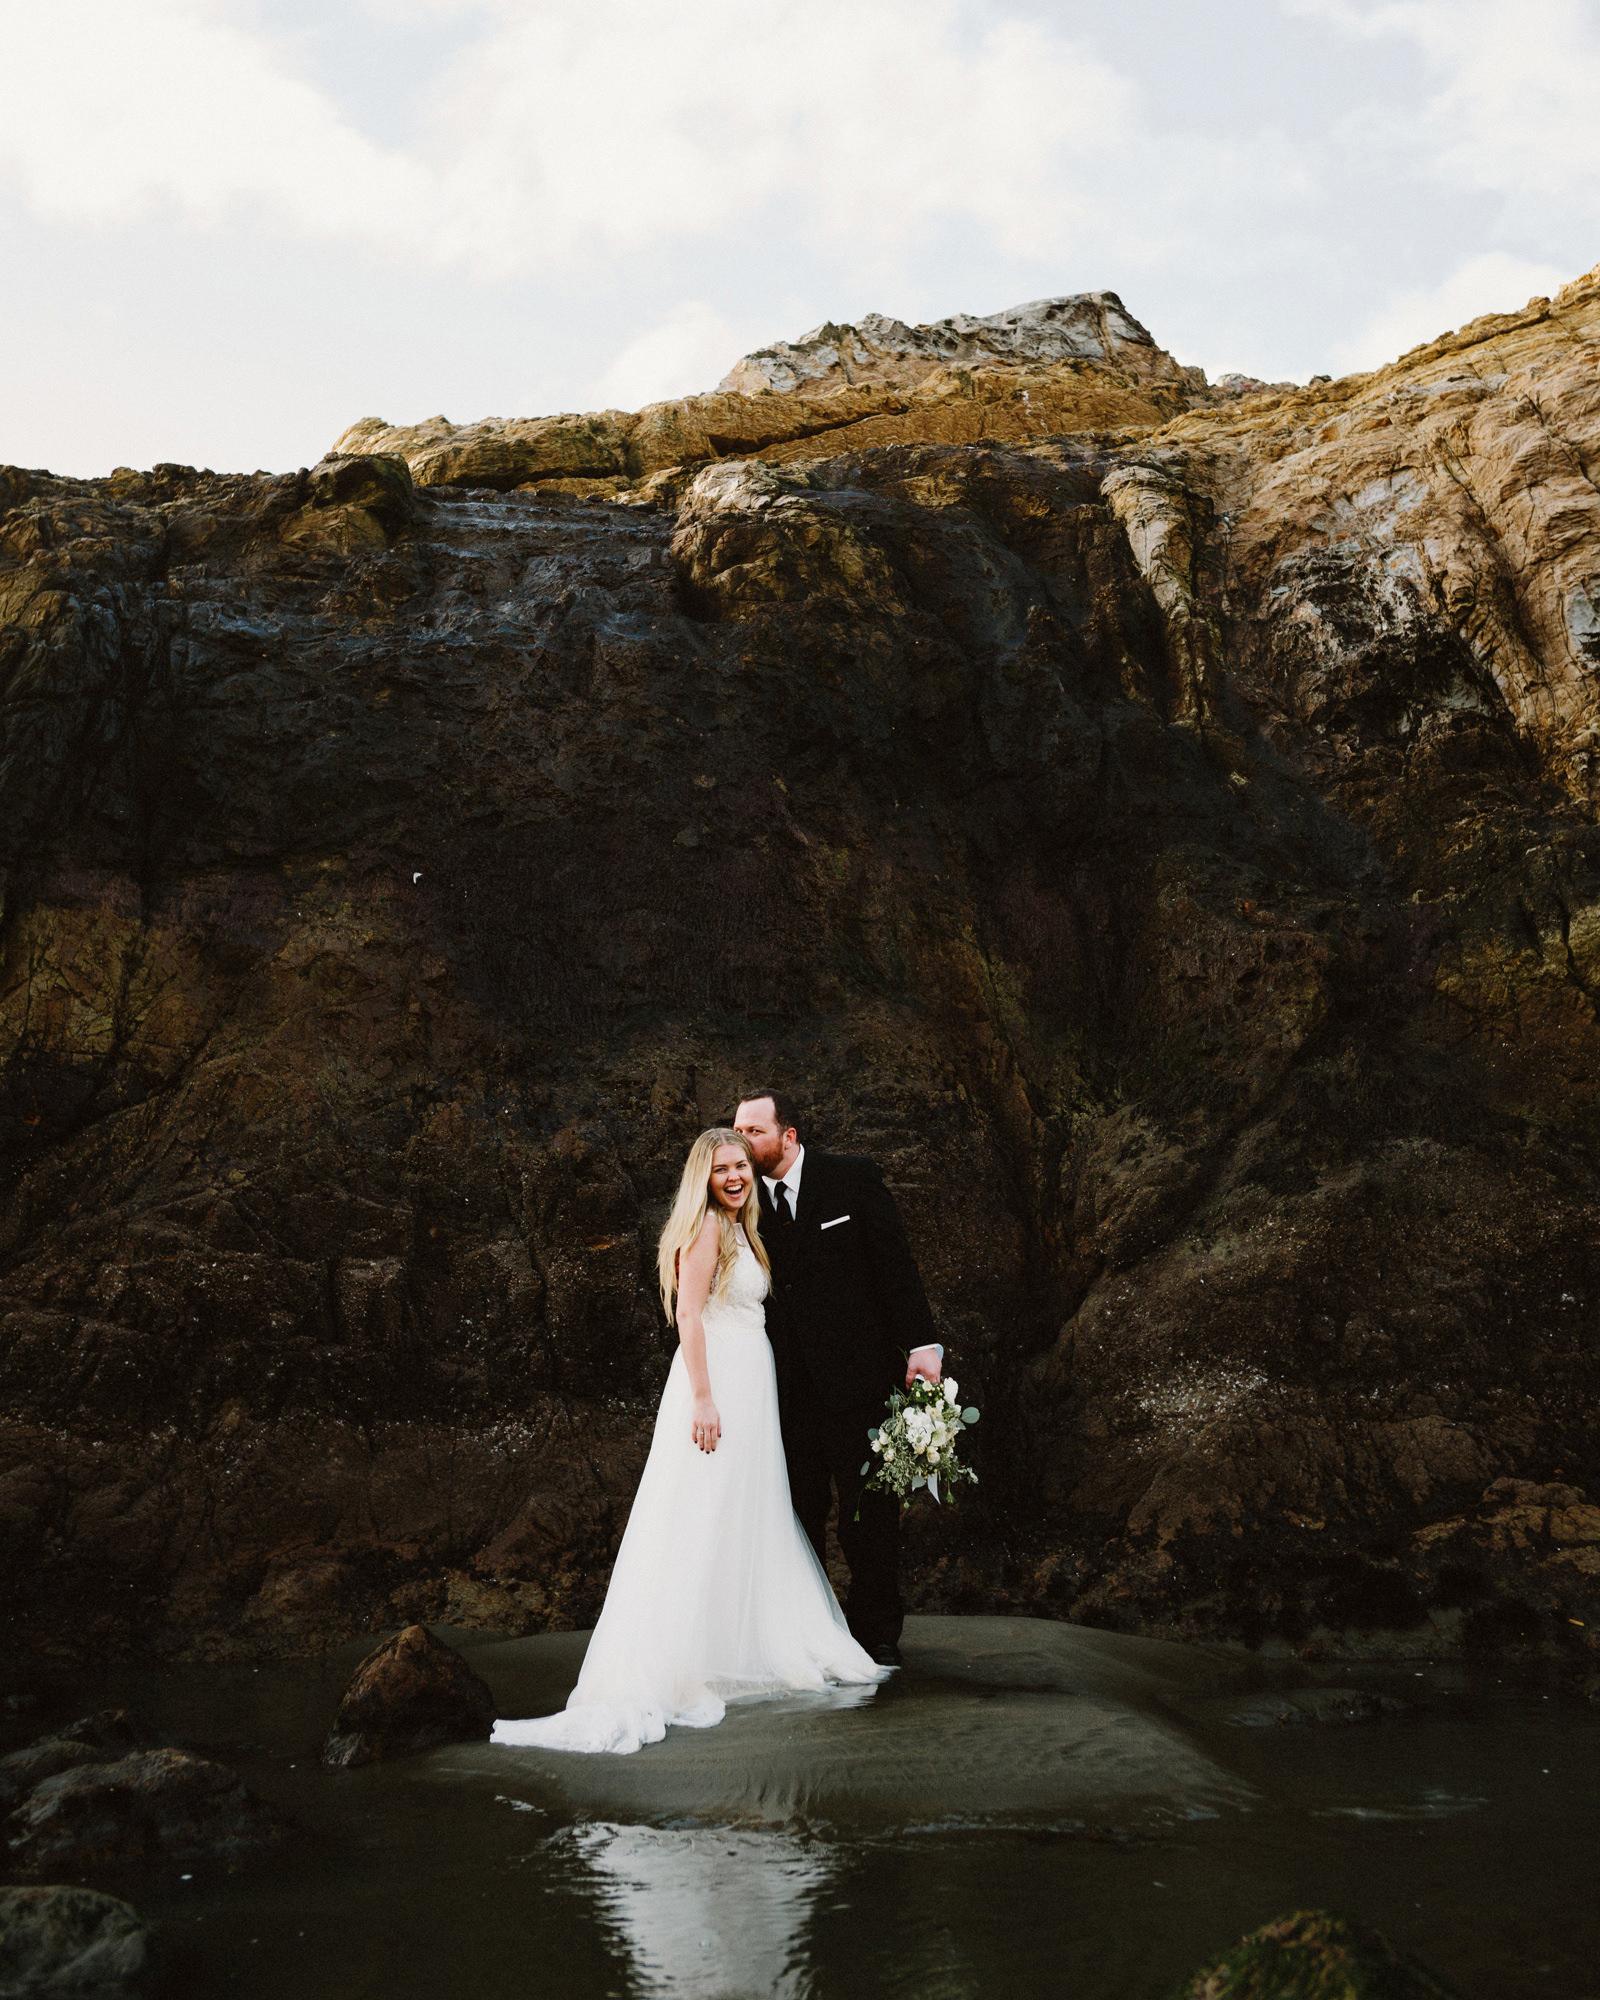 san-francisco-city-hall-elopement-53 SAN FRANCISCO CITY HALL INTIMATE WEDDING